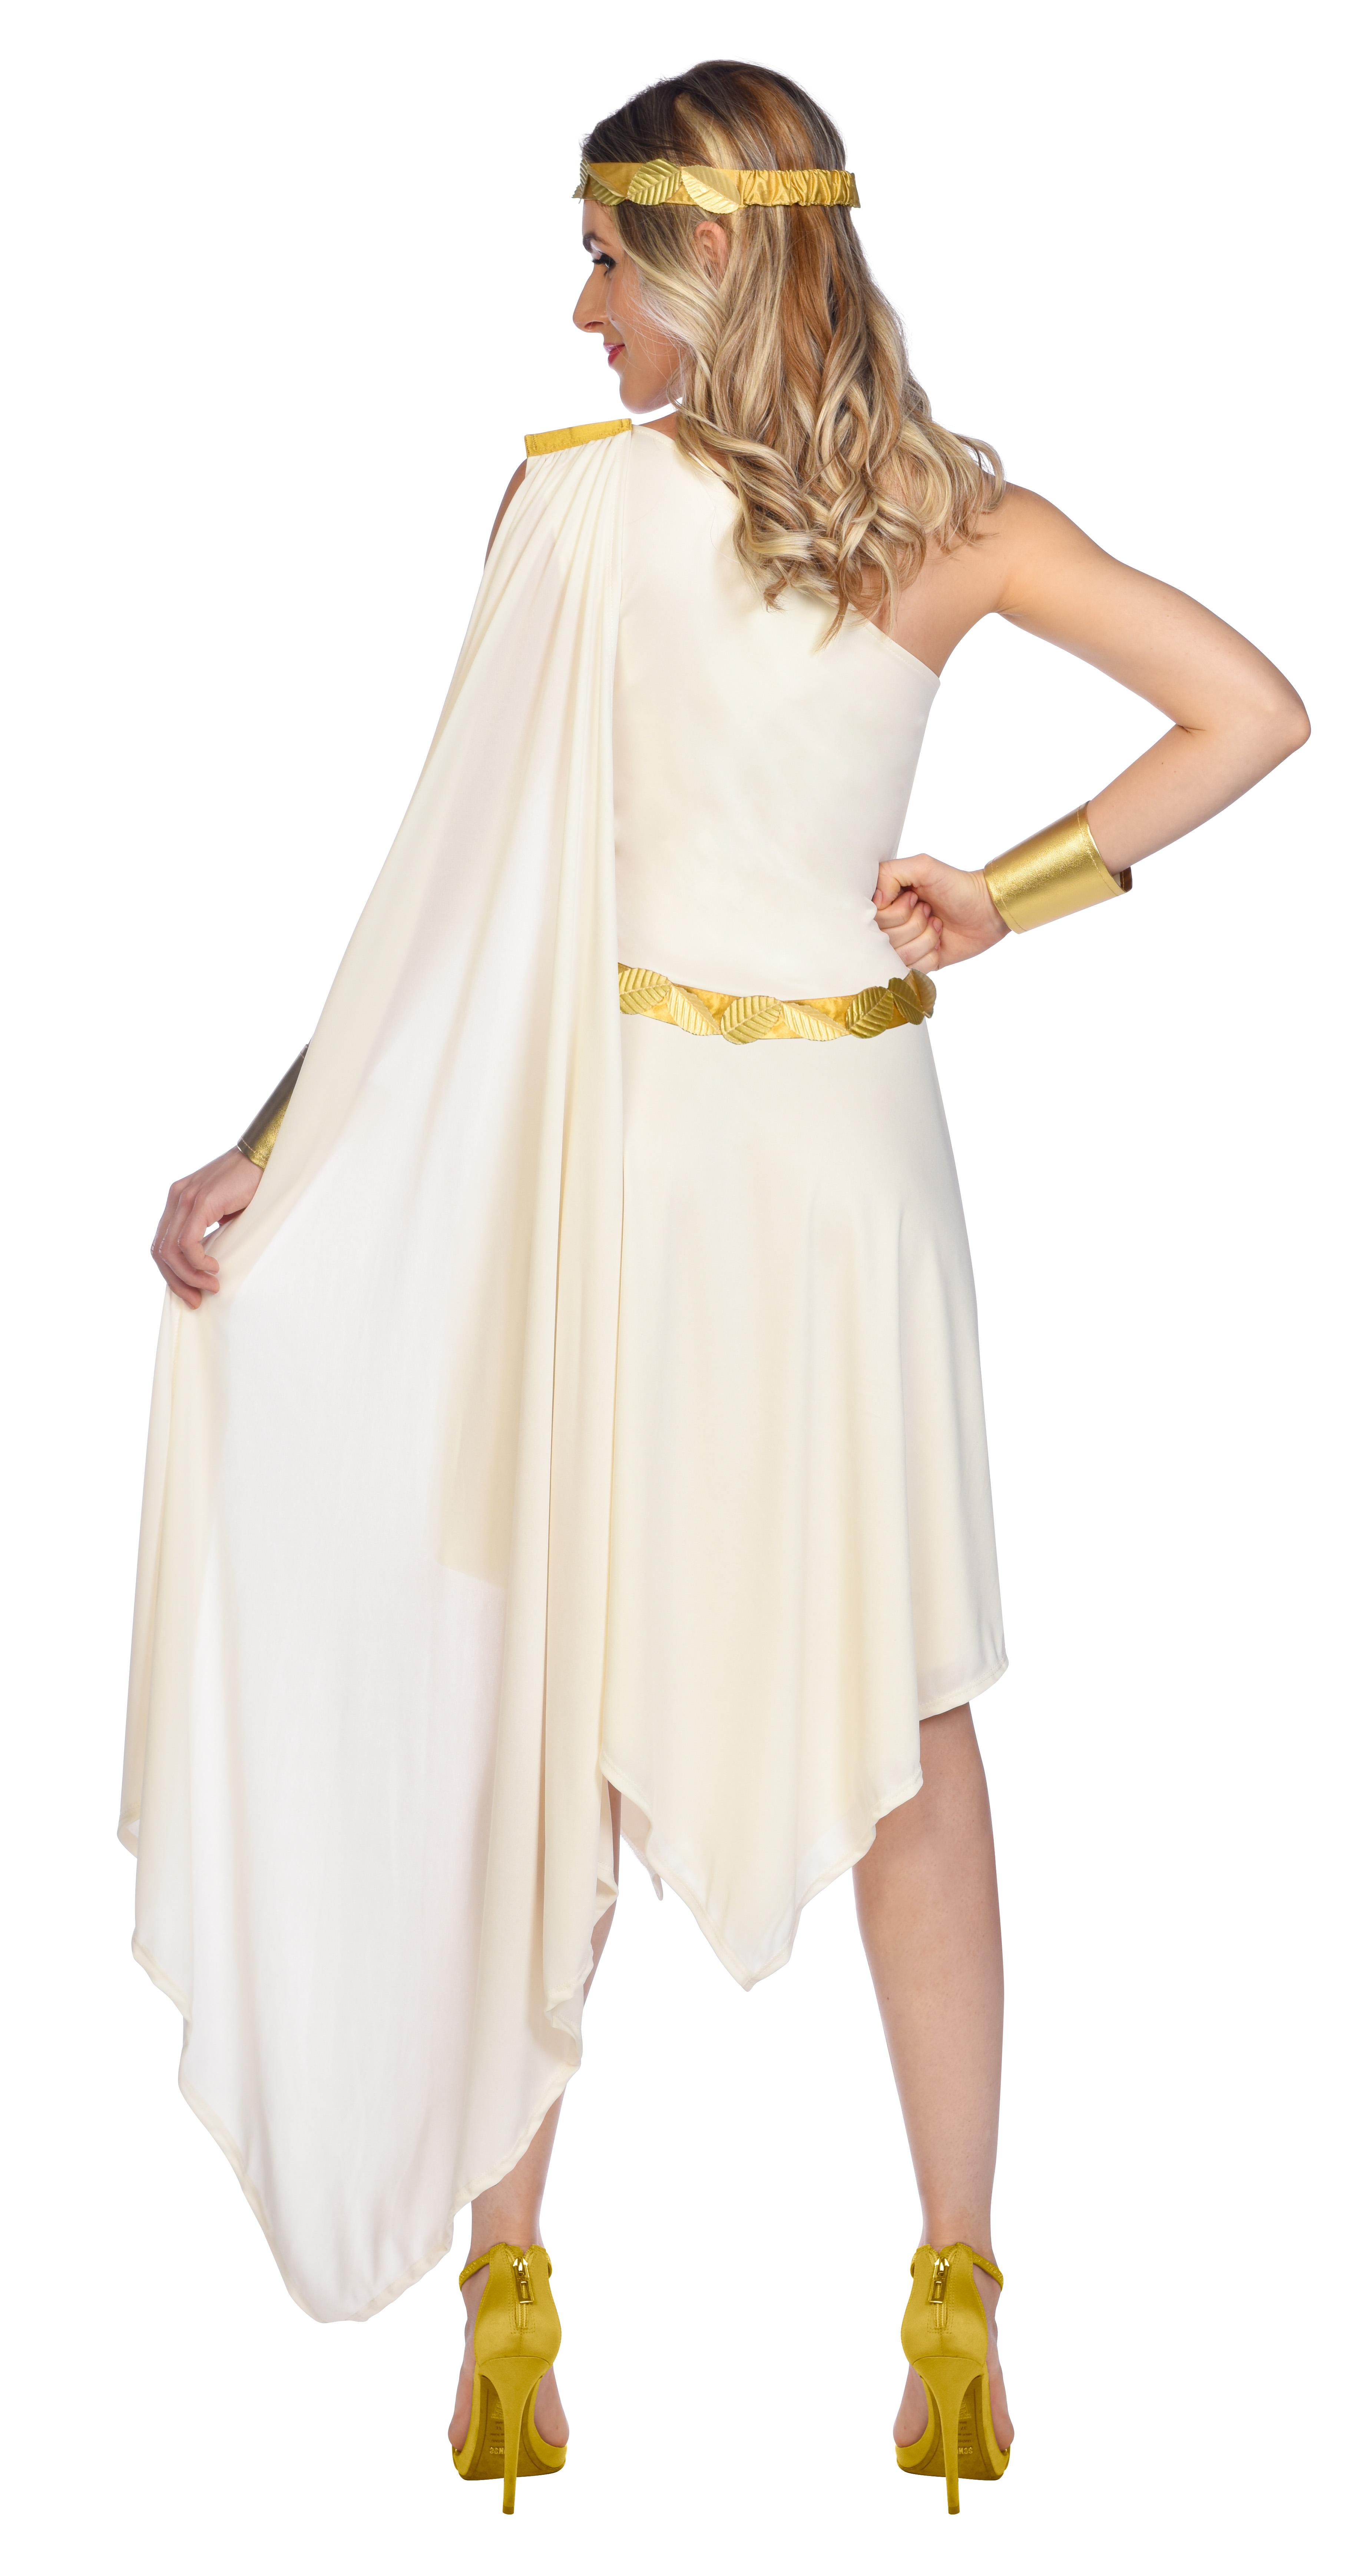 Indexbild 24 - Adult Ladies Golden Goddess Gladiator Greek Roman Toga Fancy Dress Costume New